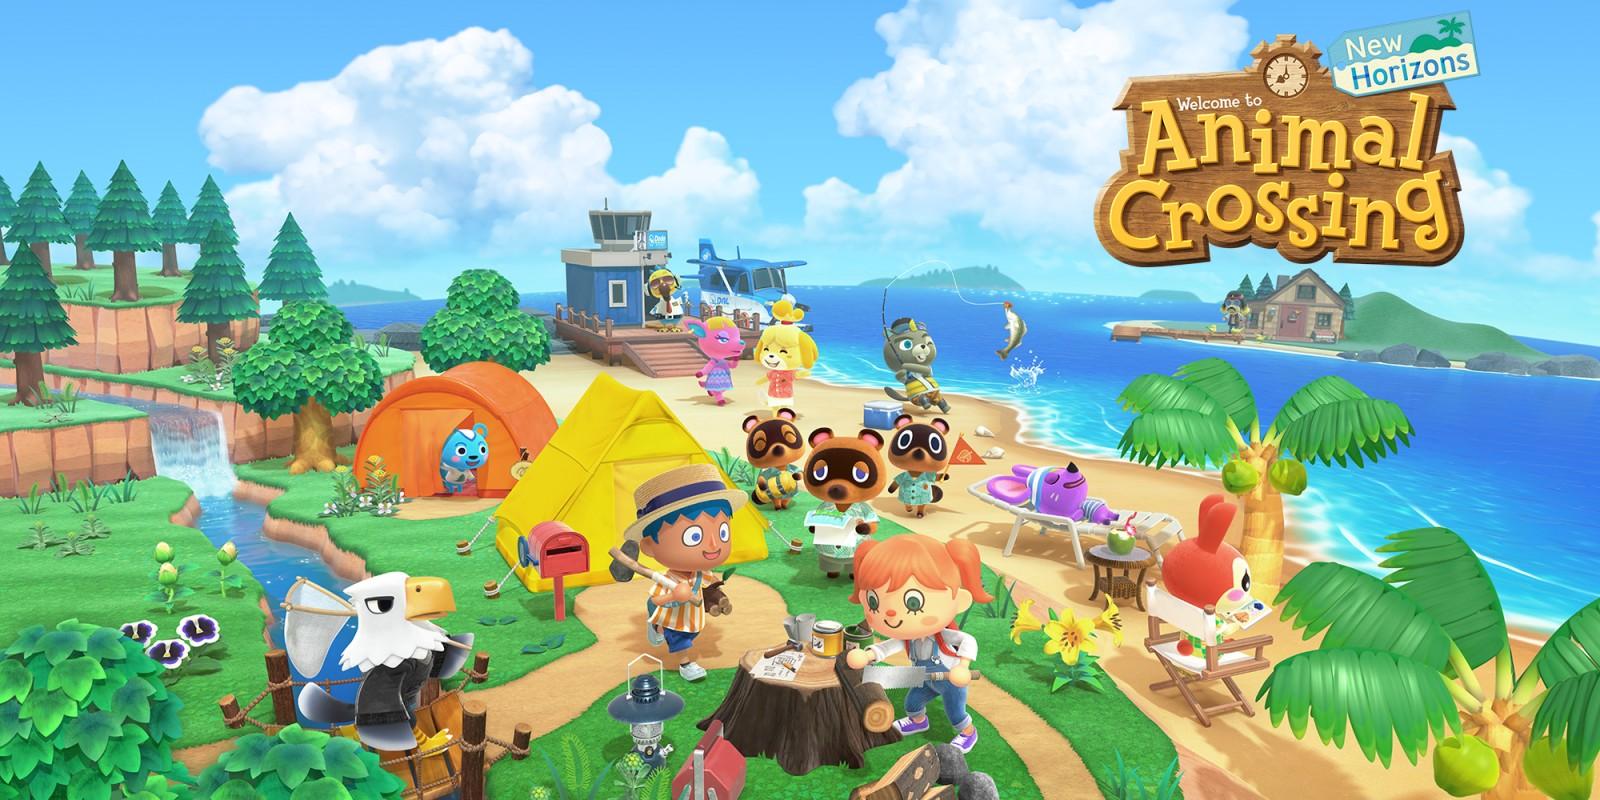 Wallpaper Animal Crossing New Horizons